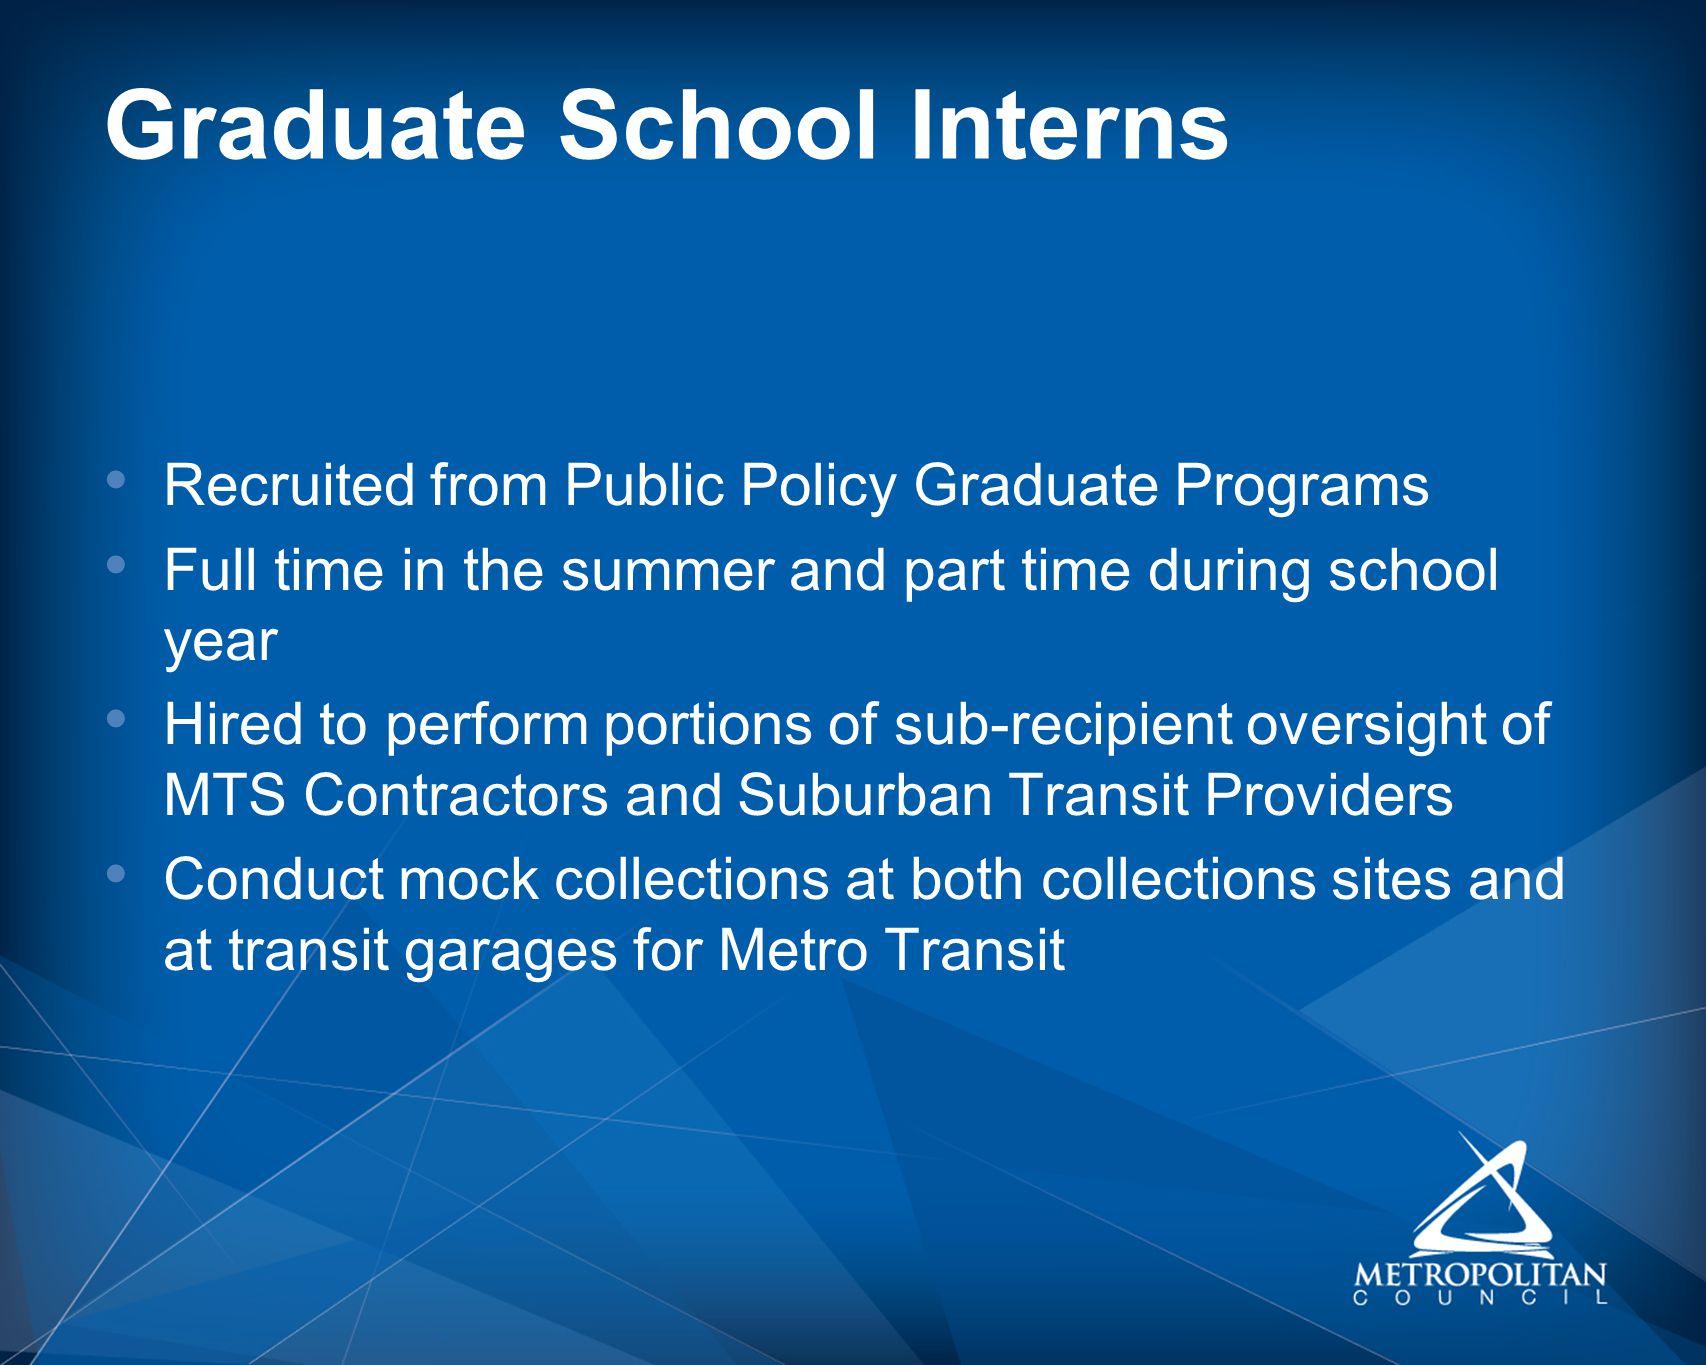 Graduate School Interns